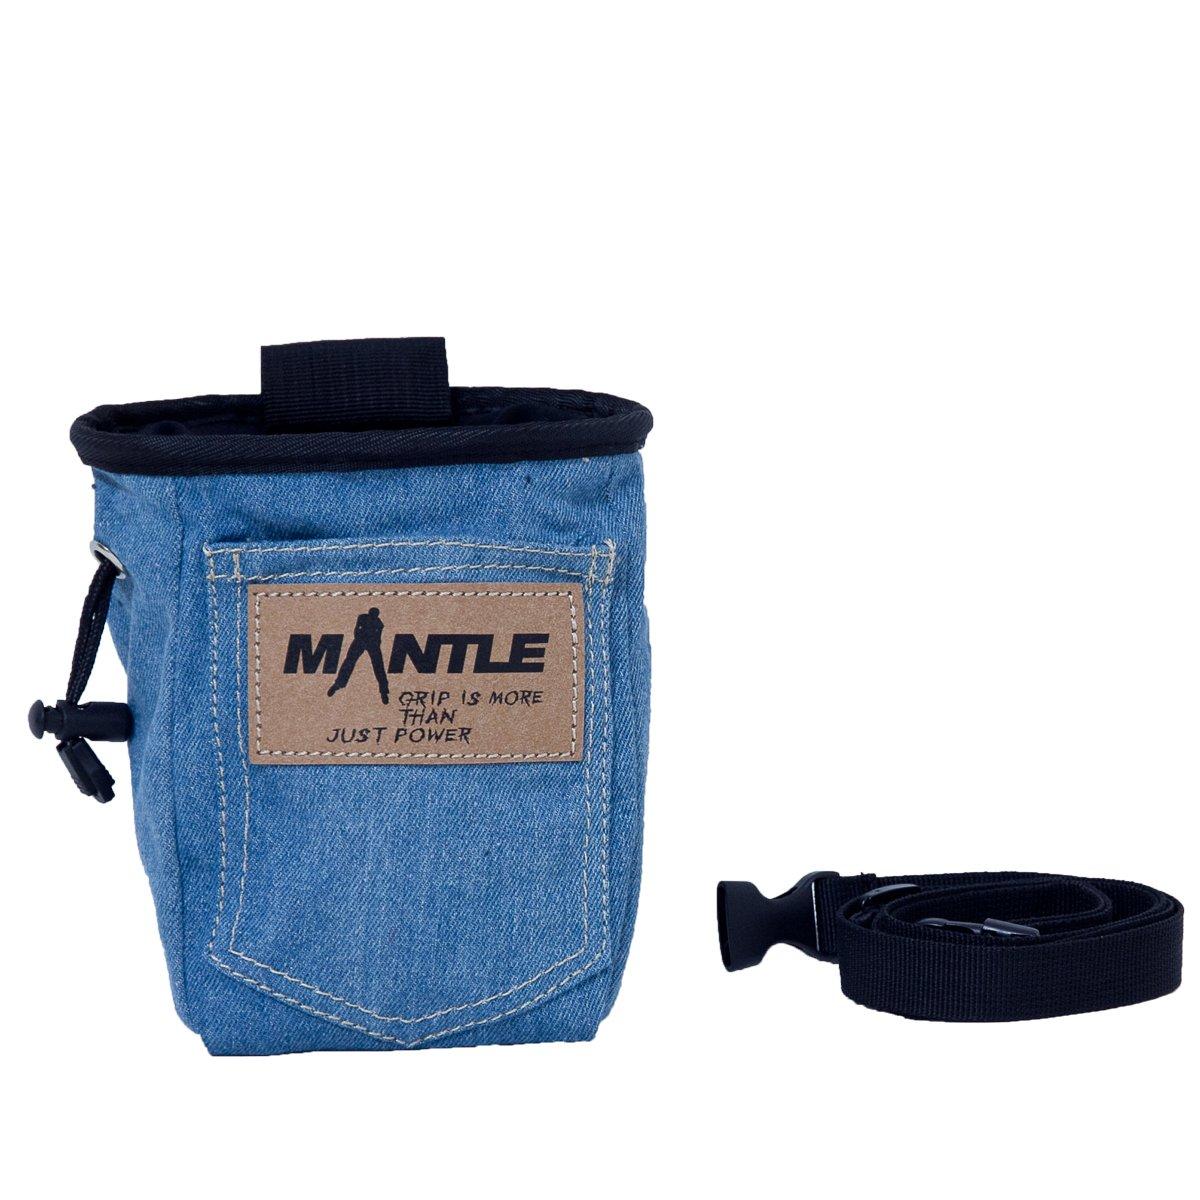 Mantle Kletterzubehör Chalk Bag - Bolsa de magnesio para Escalada, Talla One Size 3001